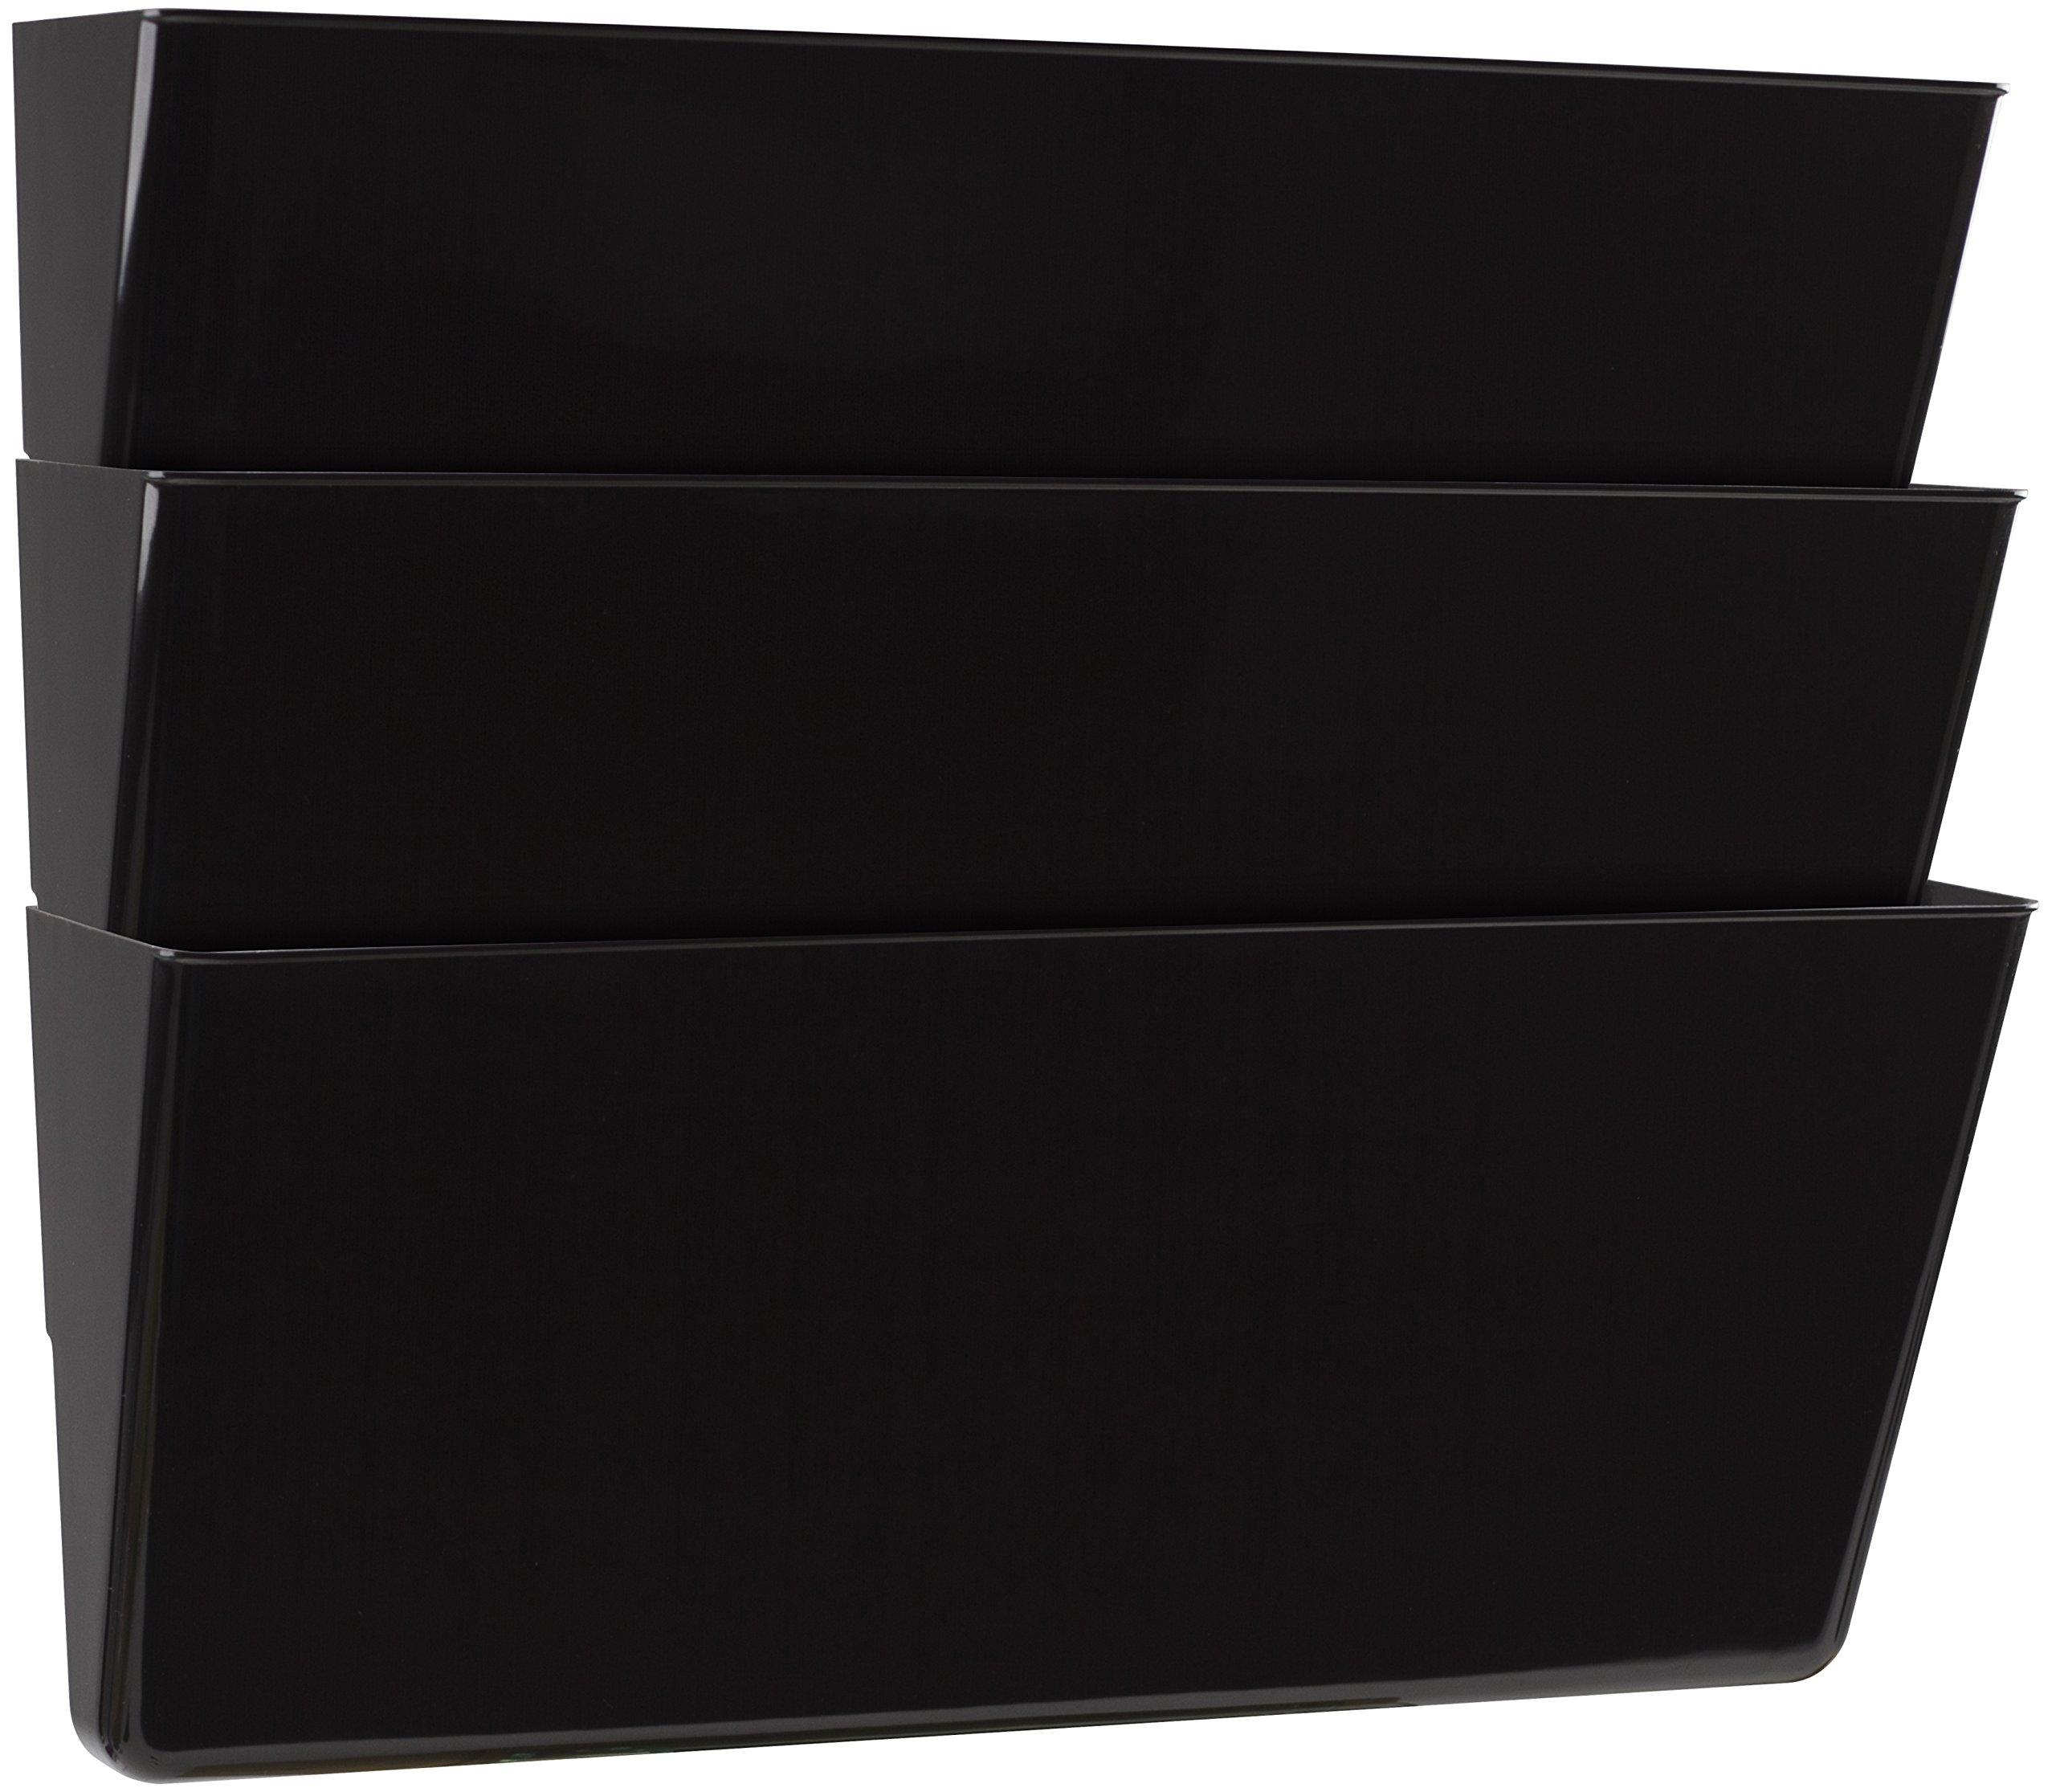 Storex Legal Sized Wall Files, 3-Pack, Black, Case of 6 (STX70228U06C)